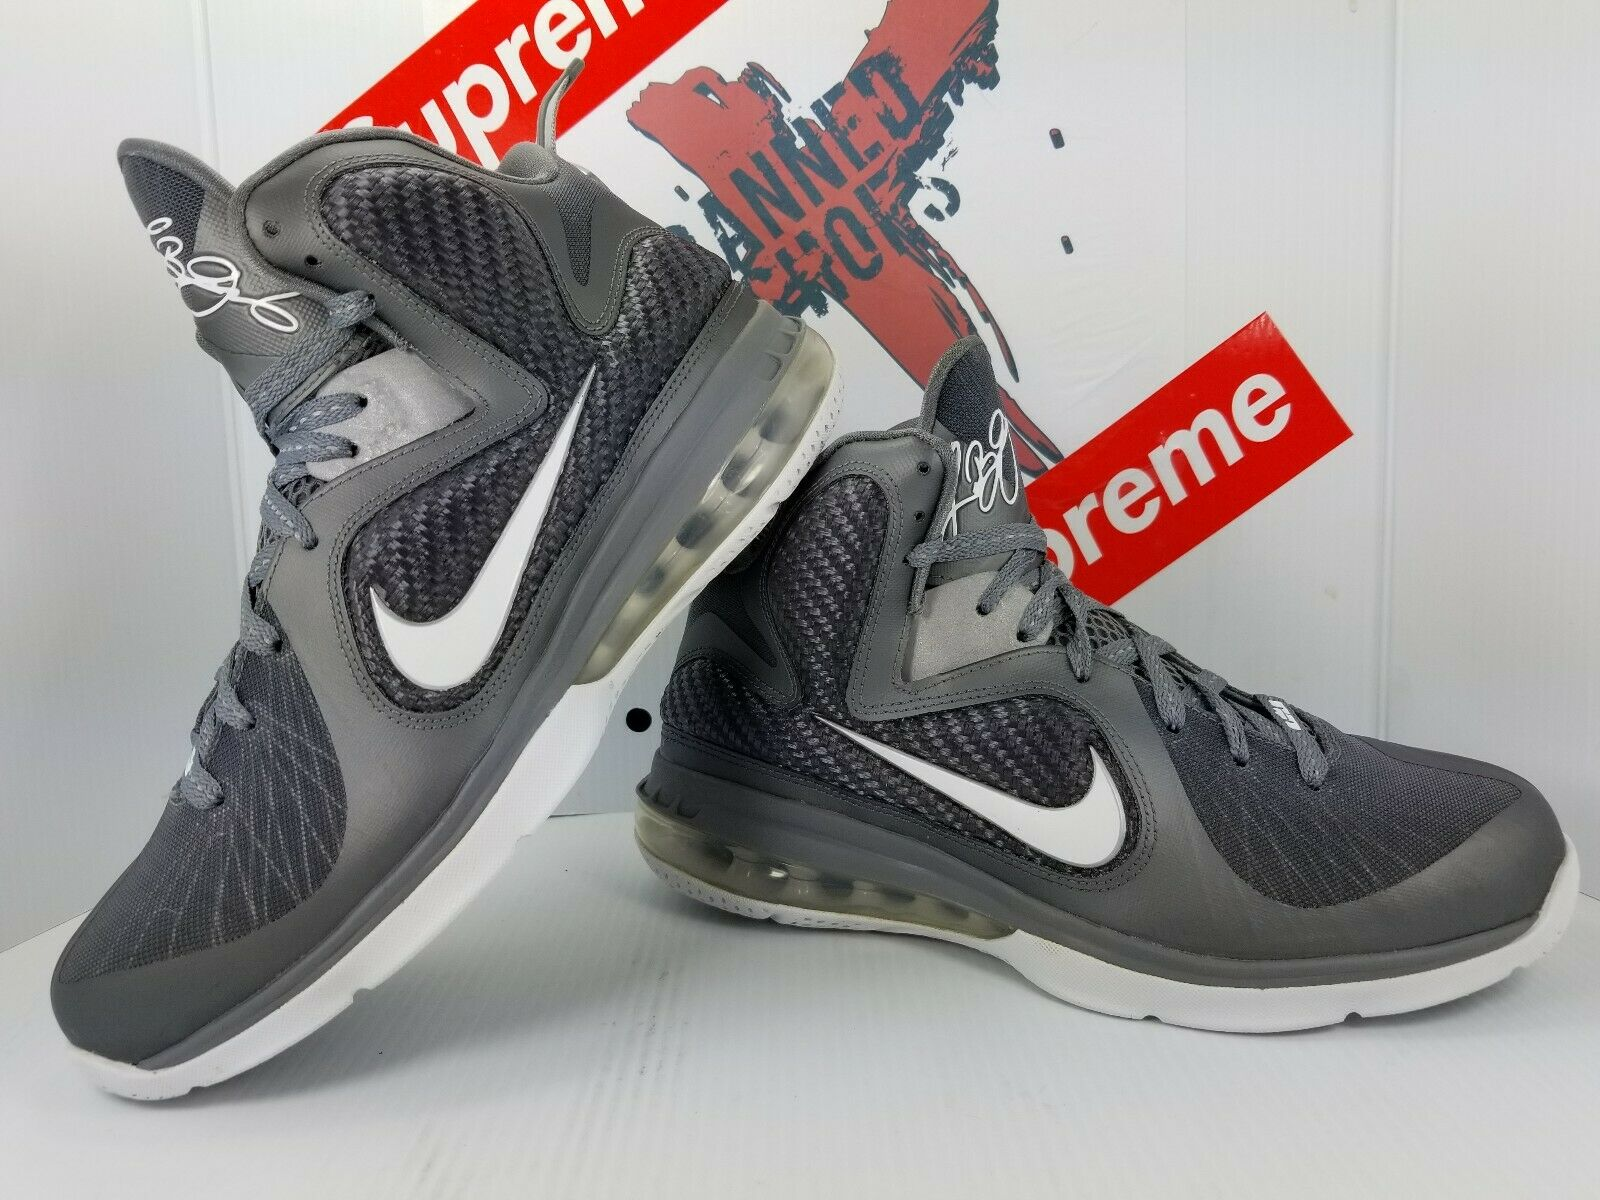 new arrivals 18c6f b6bb4 Nike Lebron 9 IX Cool Grey White Metallic Silver Silver Silver 469764-007  size 8